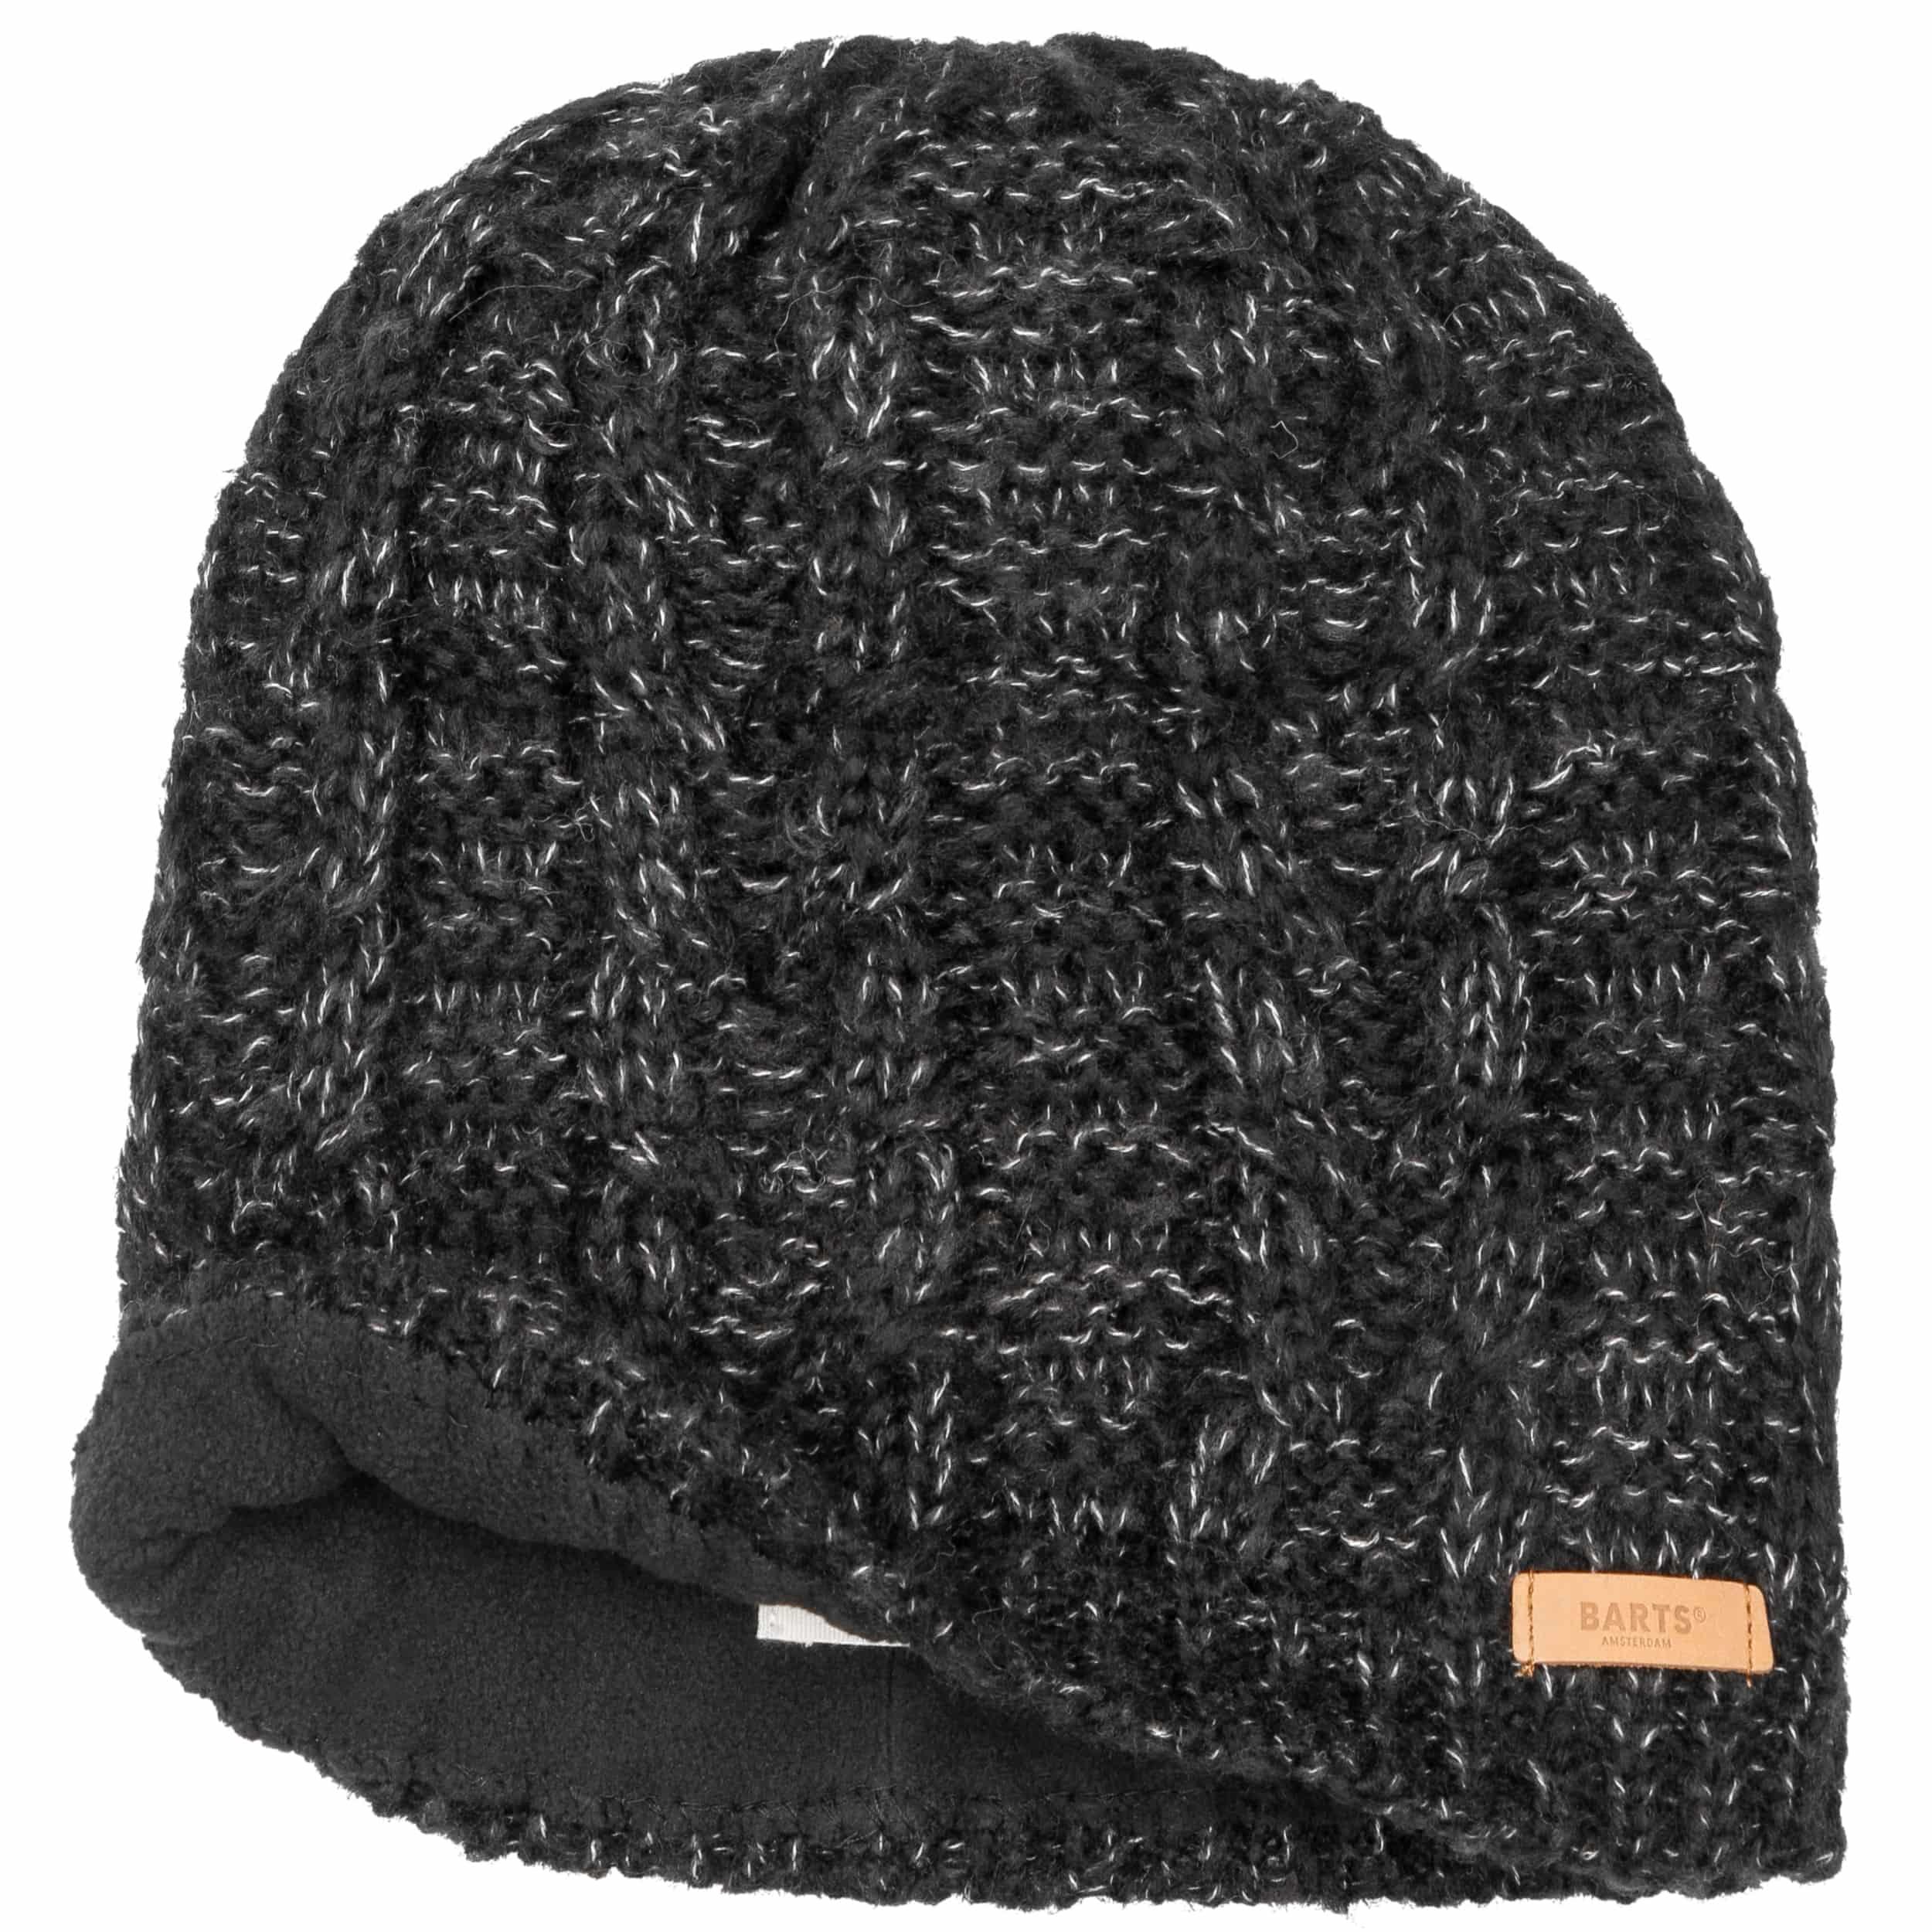 1cdf3498550 ... Anemone Long Beanie by Barts - black 1 ...